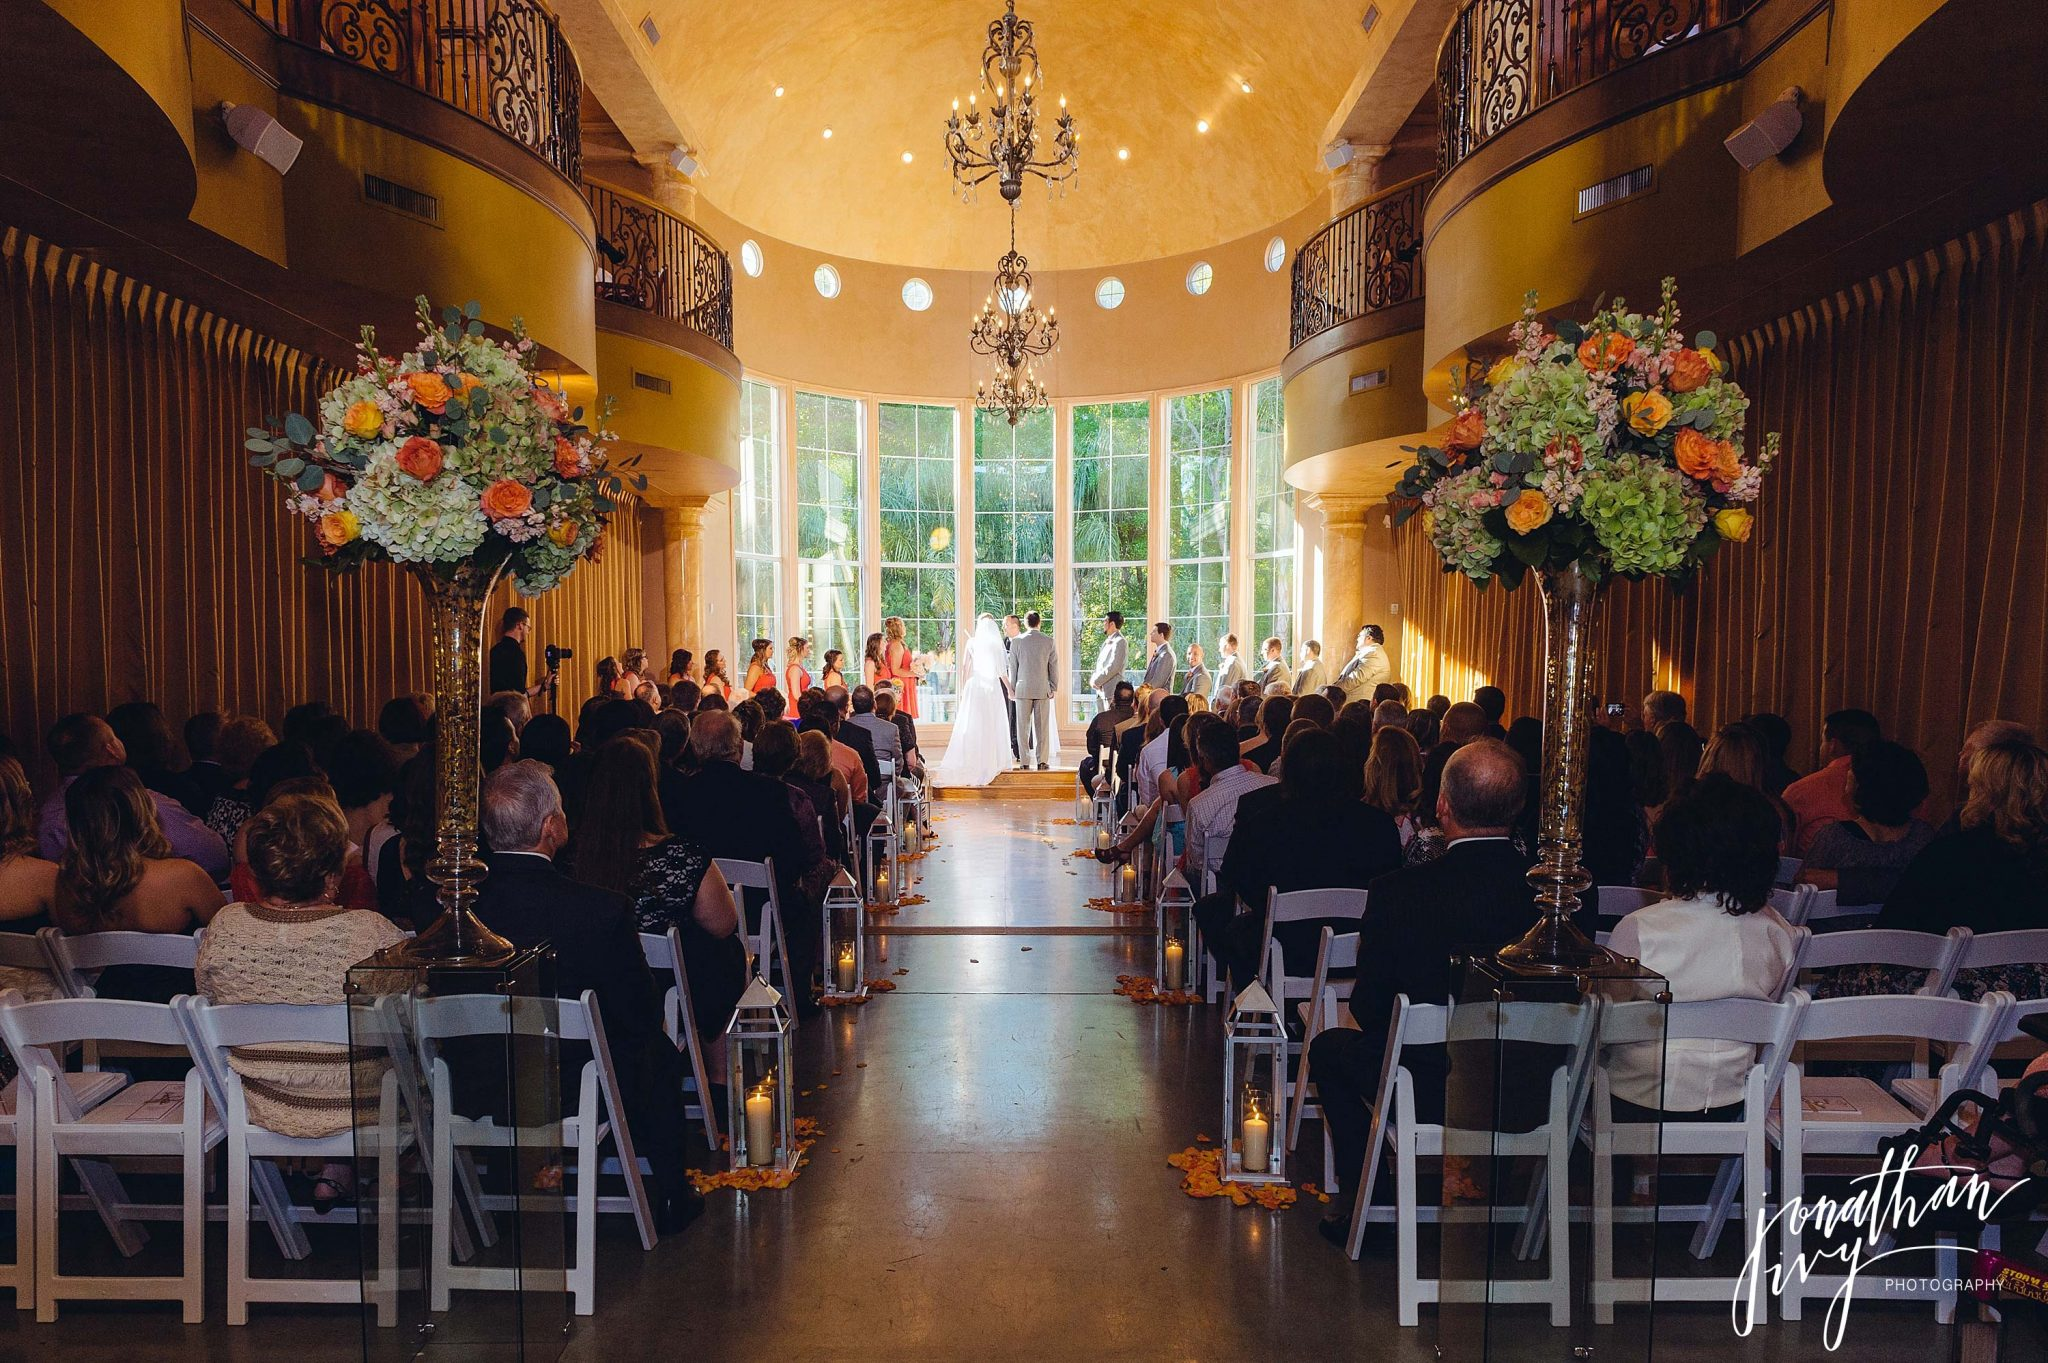 Chateau-polonez-wedding-houston_0019